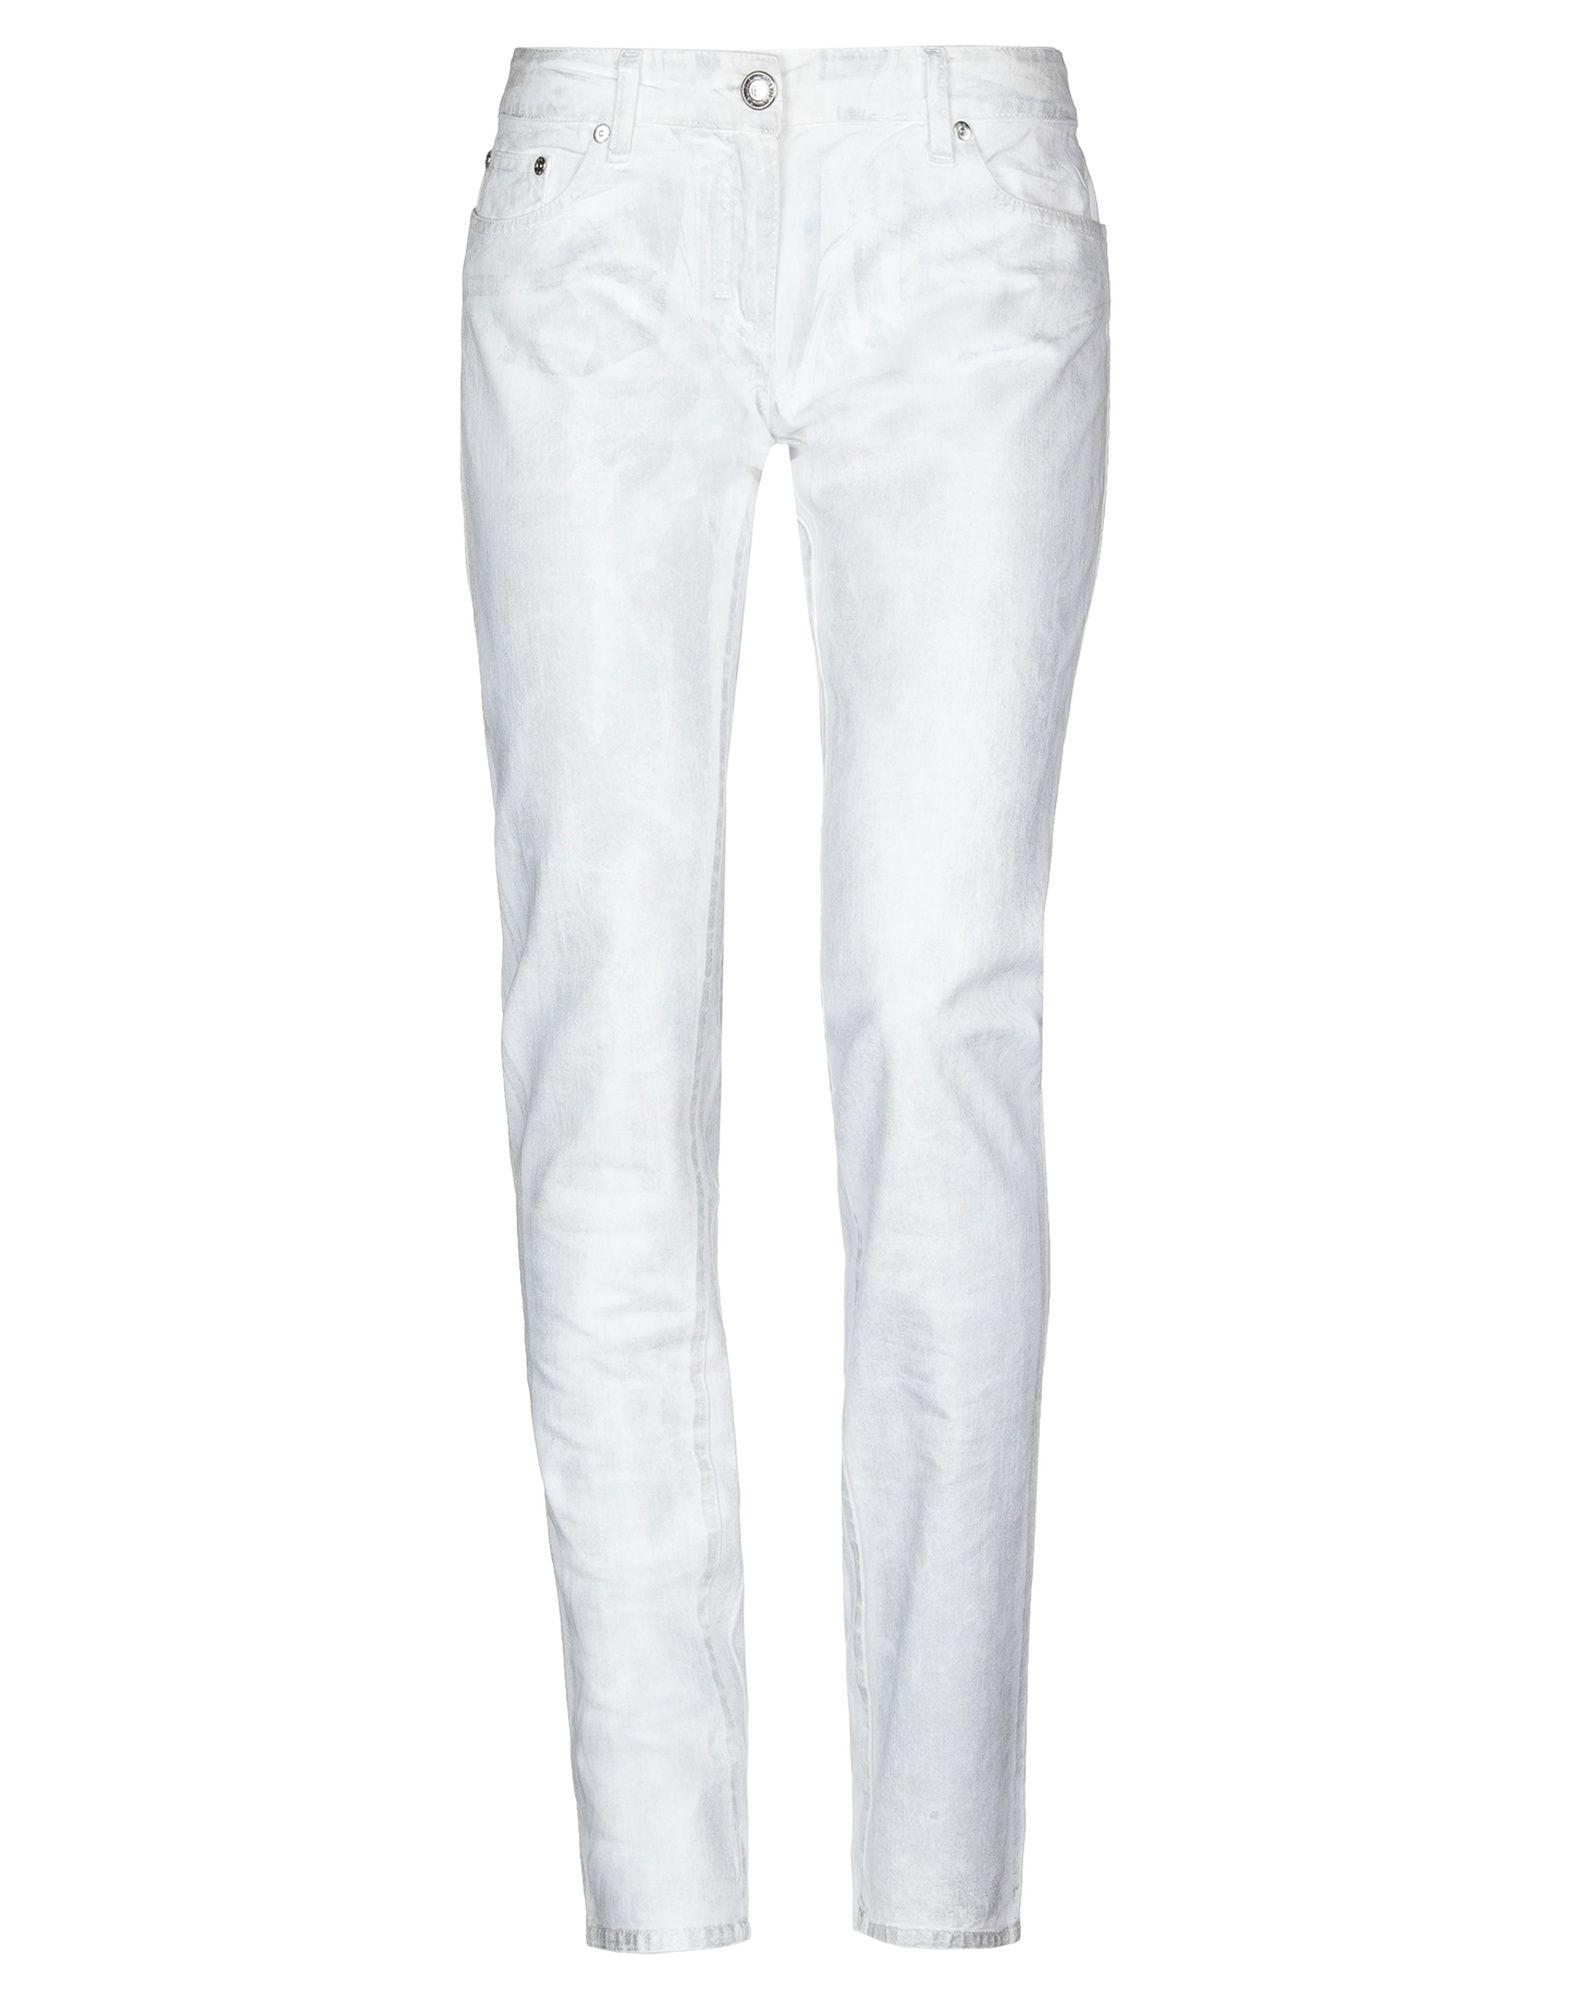 ELISABETTA FRANCHI JEANS for CELYN B. Джинсовые брюки elisabetta franchi for celyn b футболка